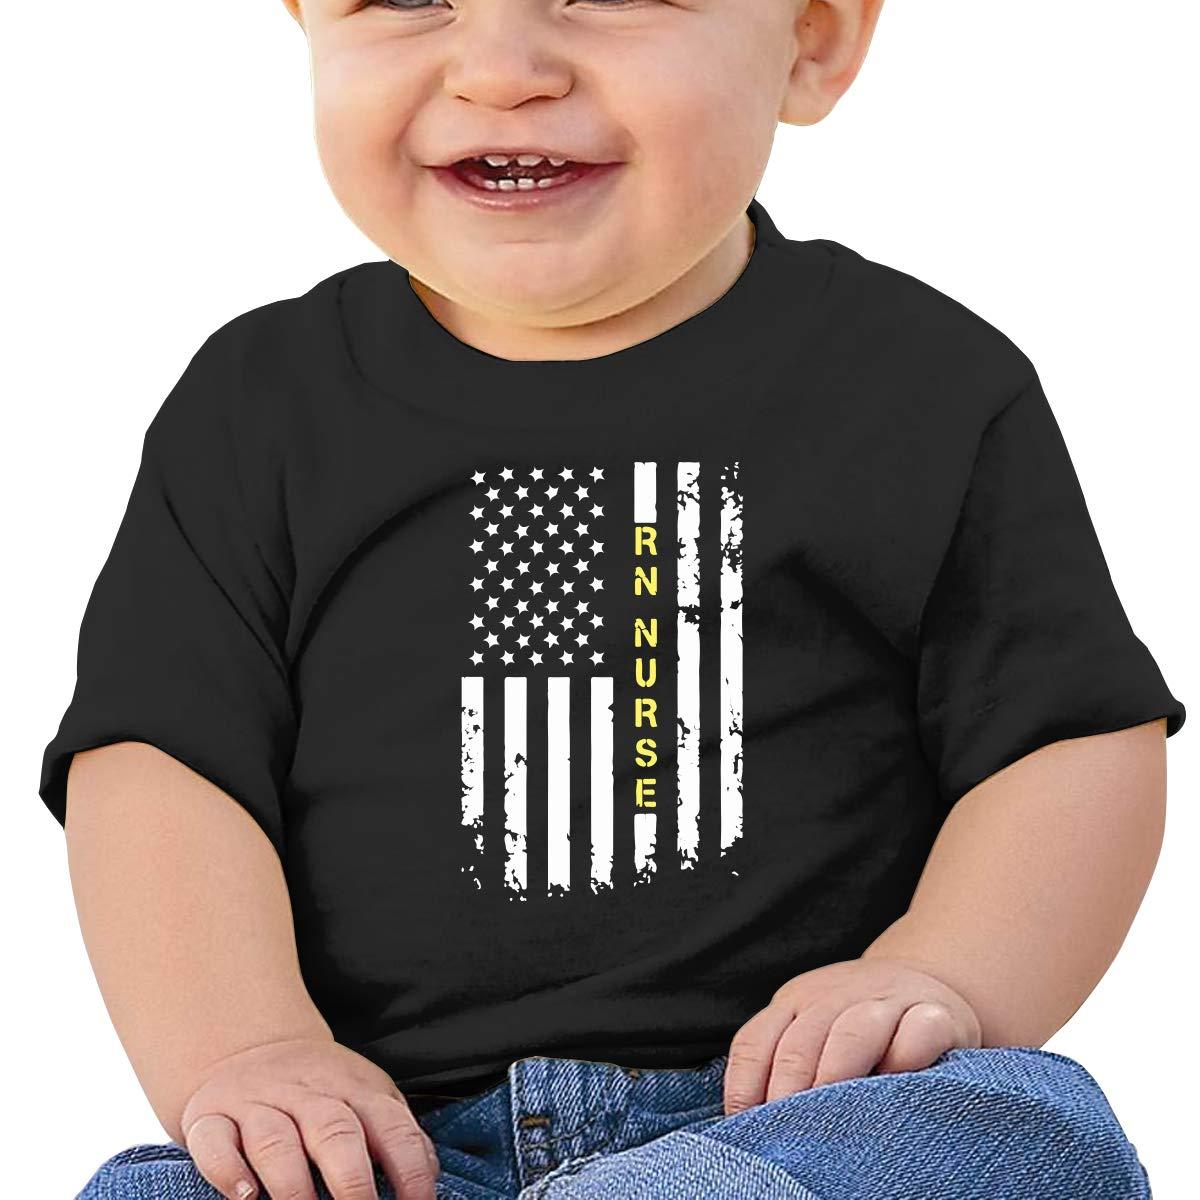 ZUGFGF-S3 Rn Nurse American Flag Baby Boy Newborn Short Sleeve T Shirts 6-24 Month Cotton Tops